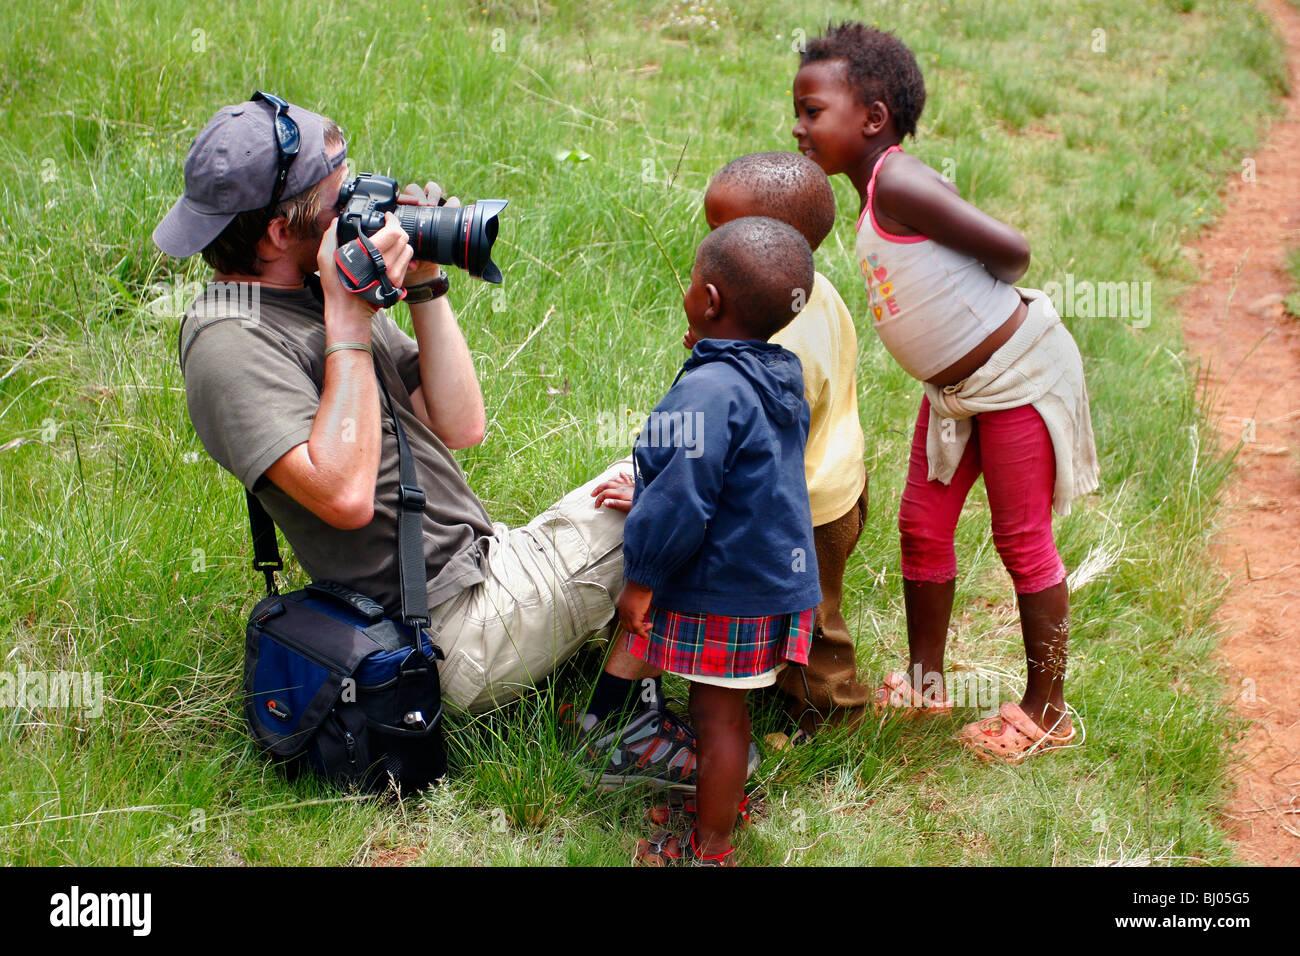 Fotograf in Lesotho mit neugierige Kinder Stockbild